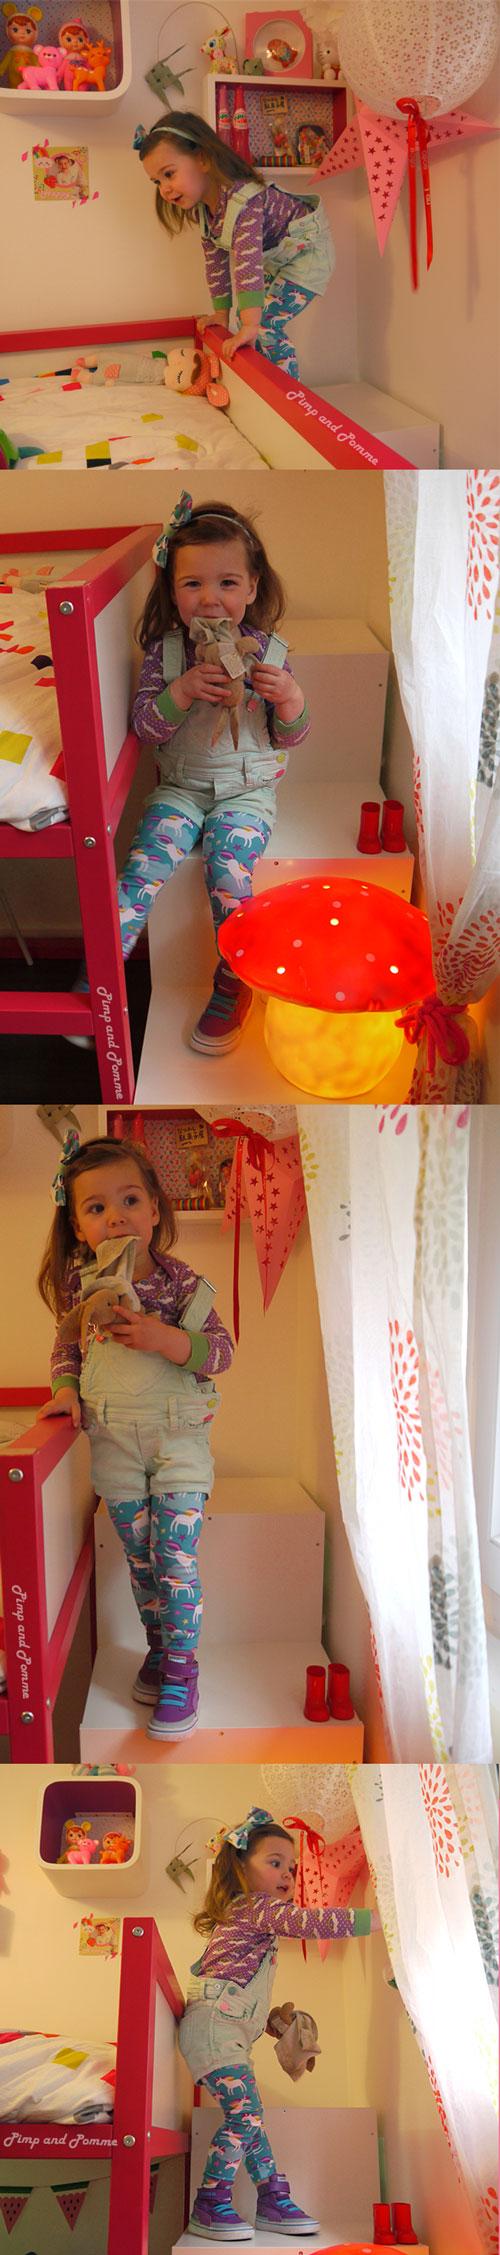 Princesse-licorne-mini-looks-magiques-miniparaniod-pimpandpomme